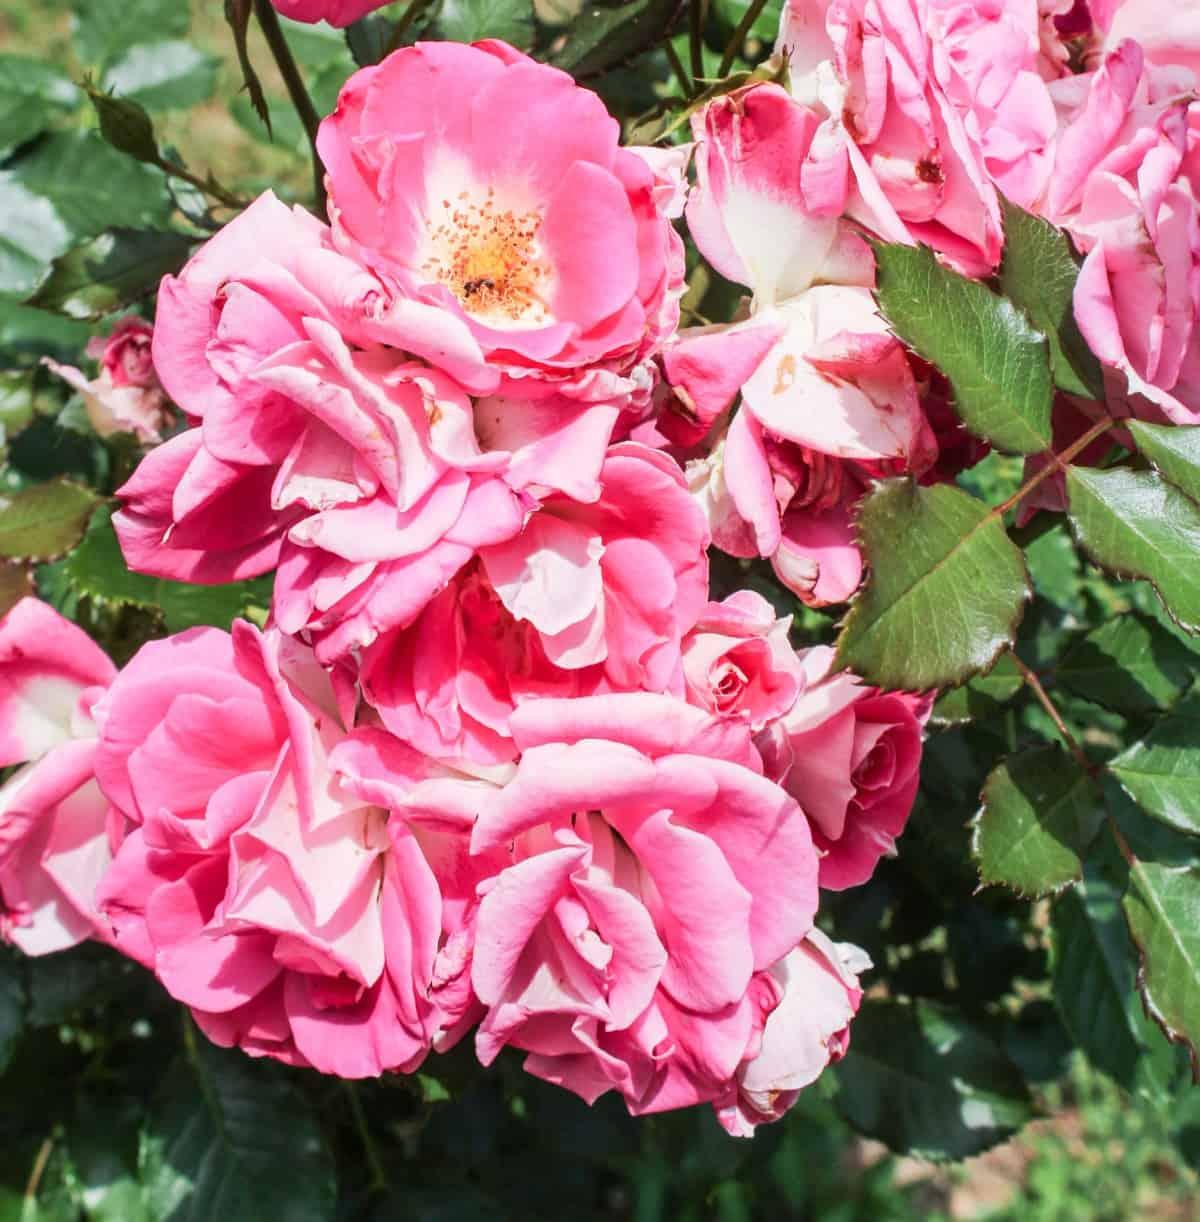 floribunda roses are hardy, fragrant, and easy to grow